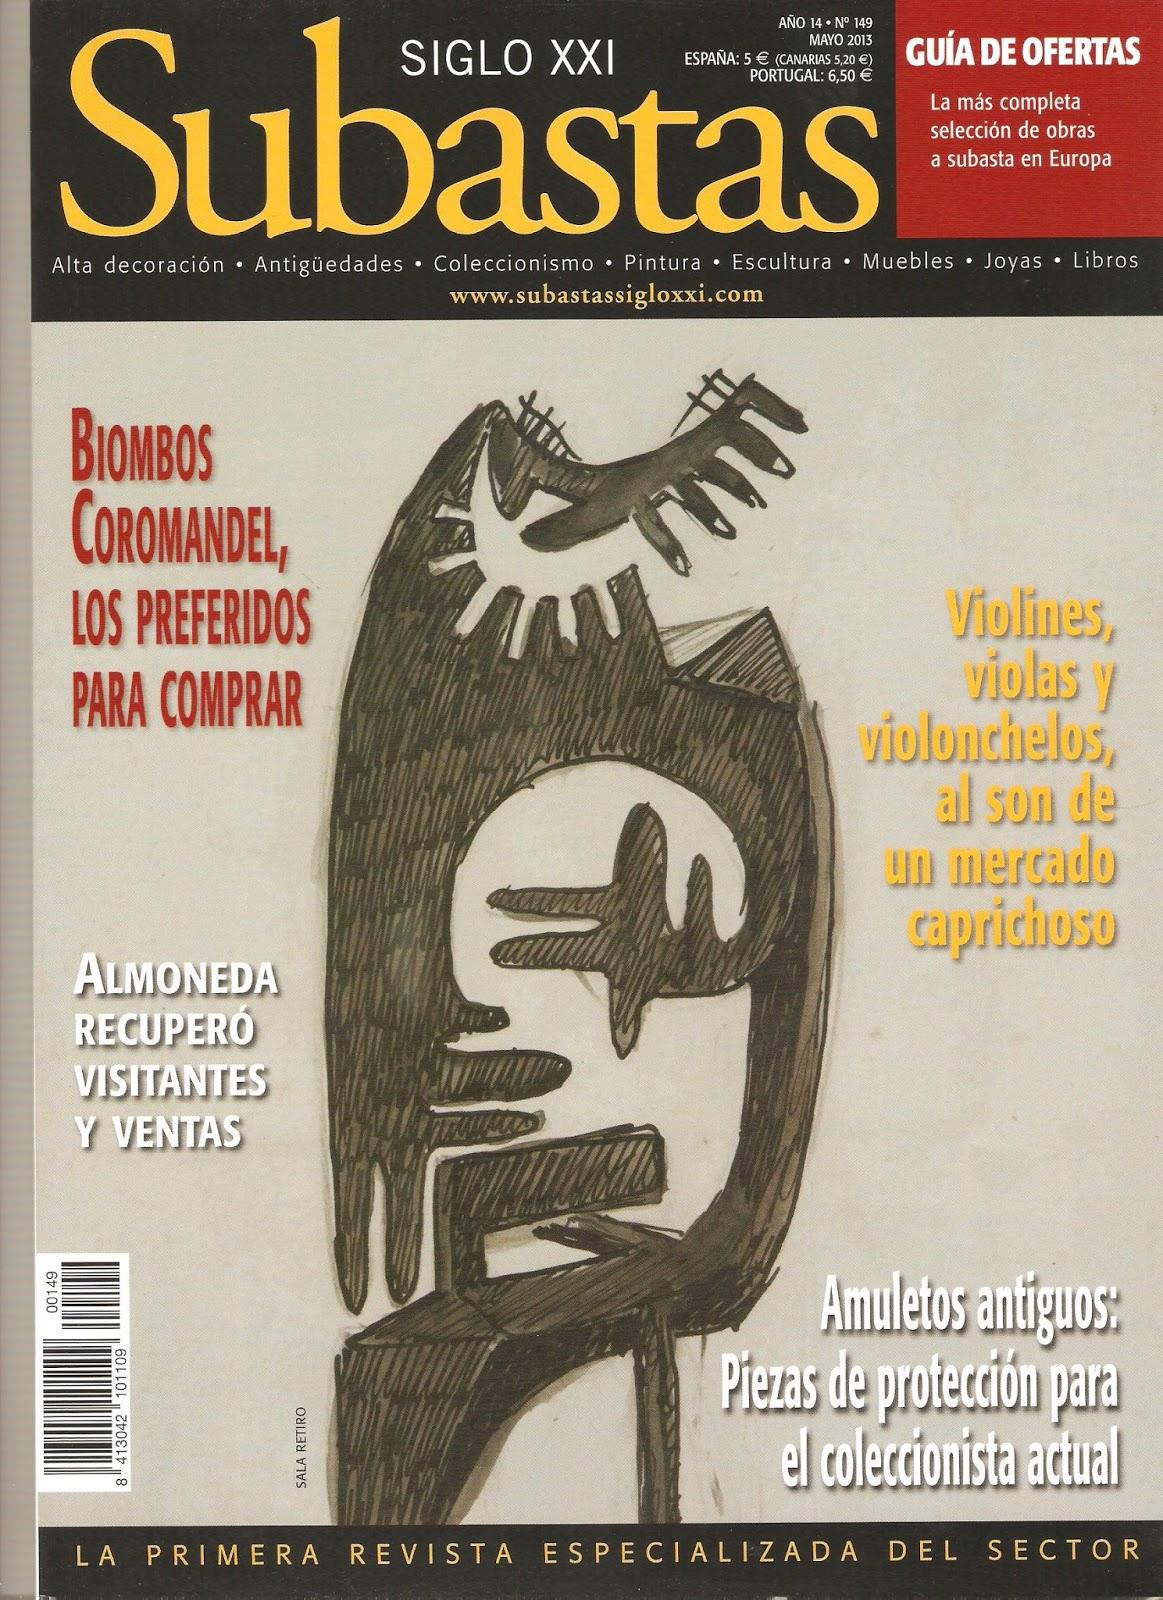 Restaurata biombos coromandel colaboraci n de restaurata for Historia del mueble pdf